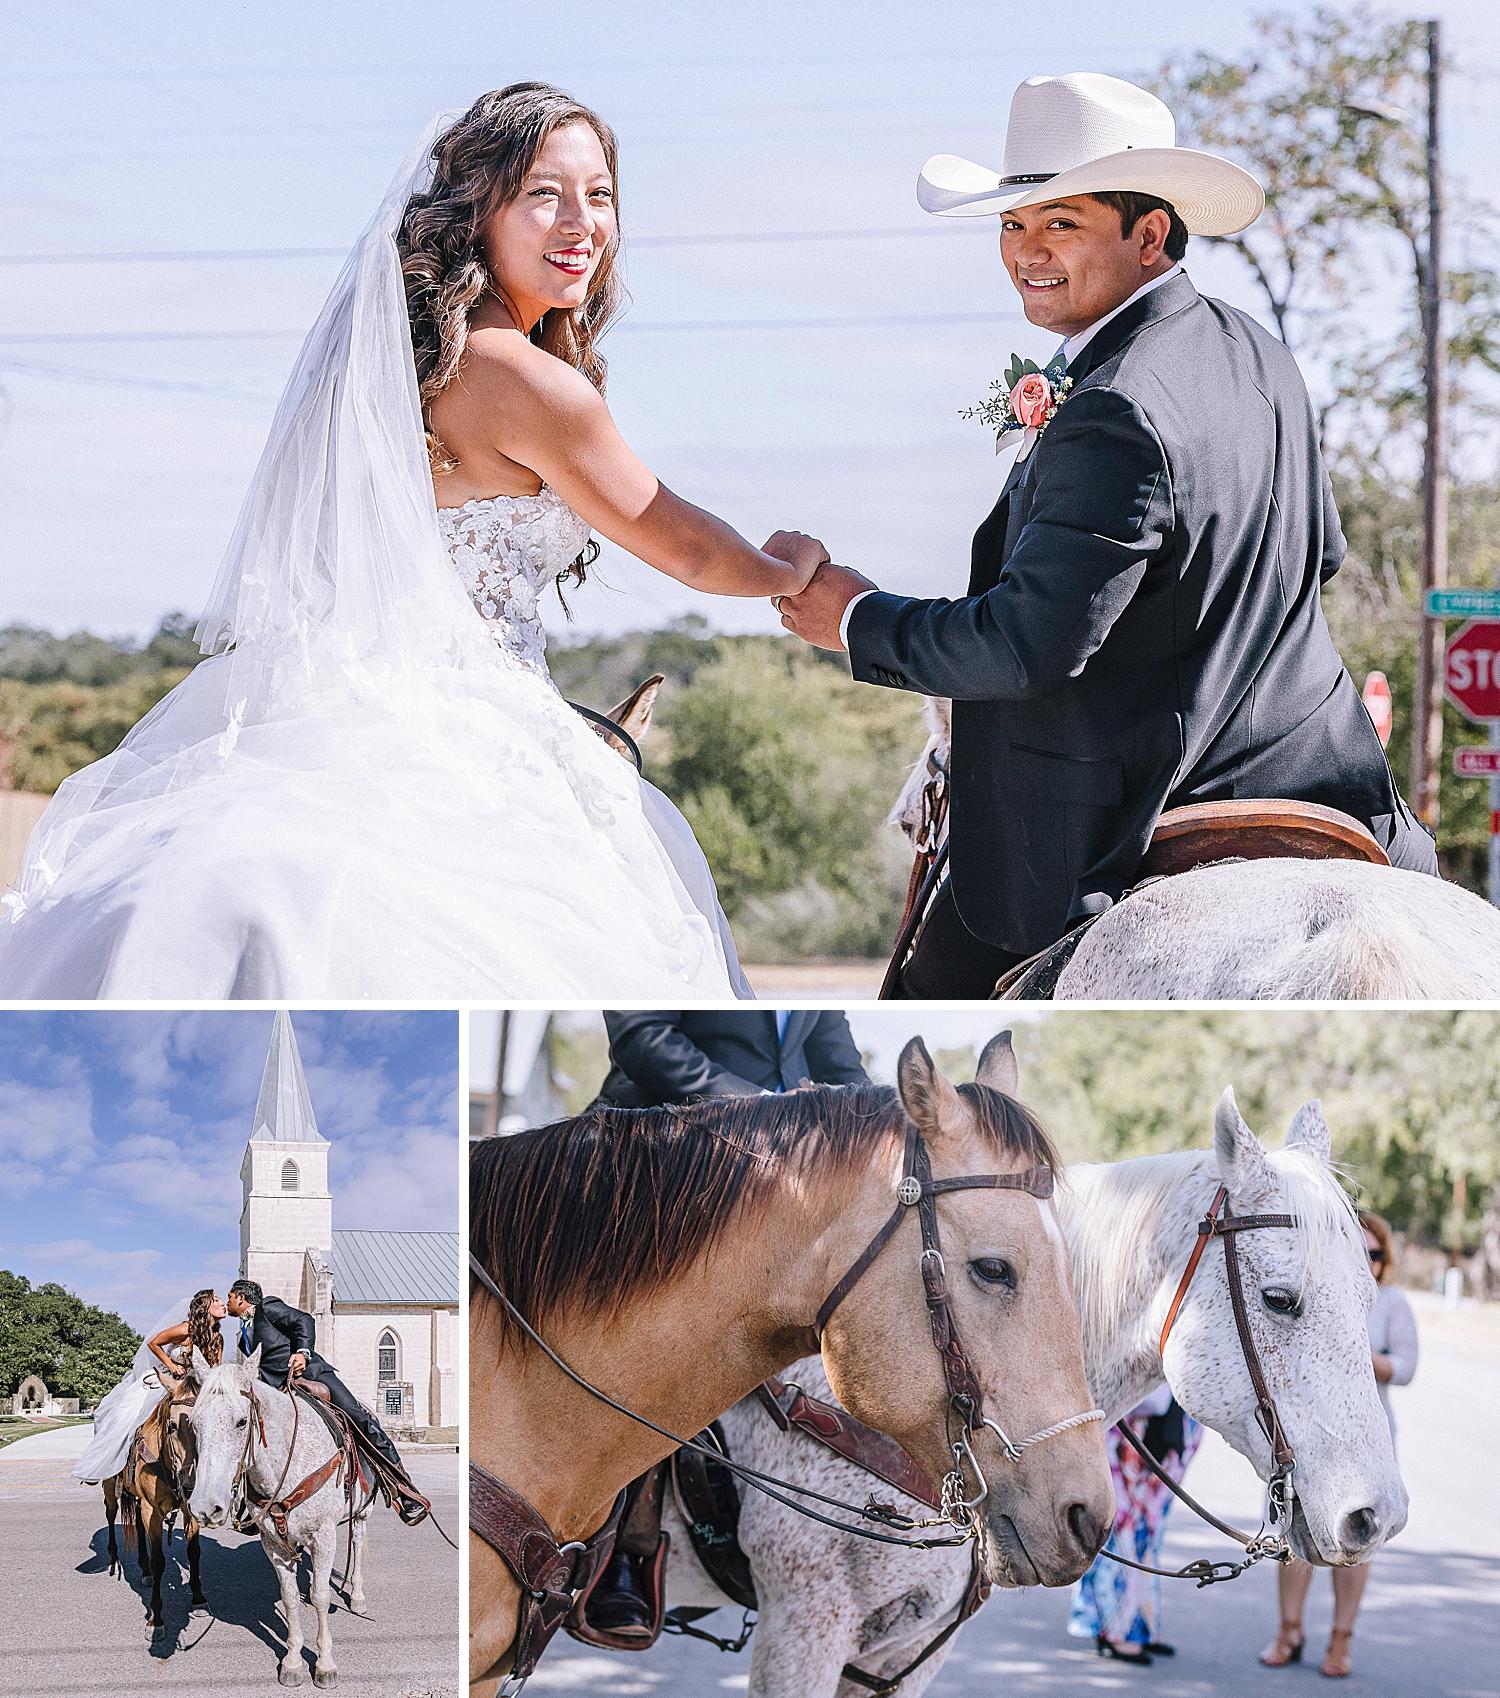 Bandera-Texas-Wedding-Photographer-Bride-Groom-on-Horses-Carly-Barton-Photography_0103.jpg